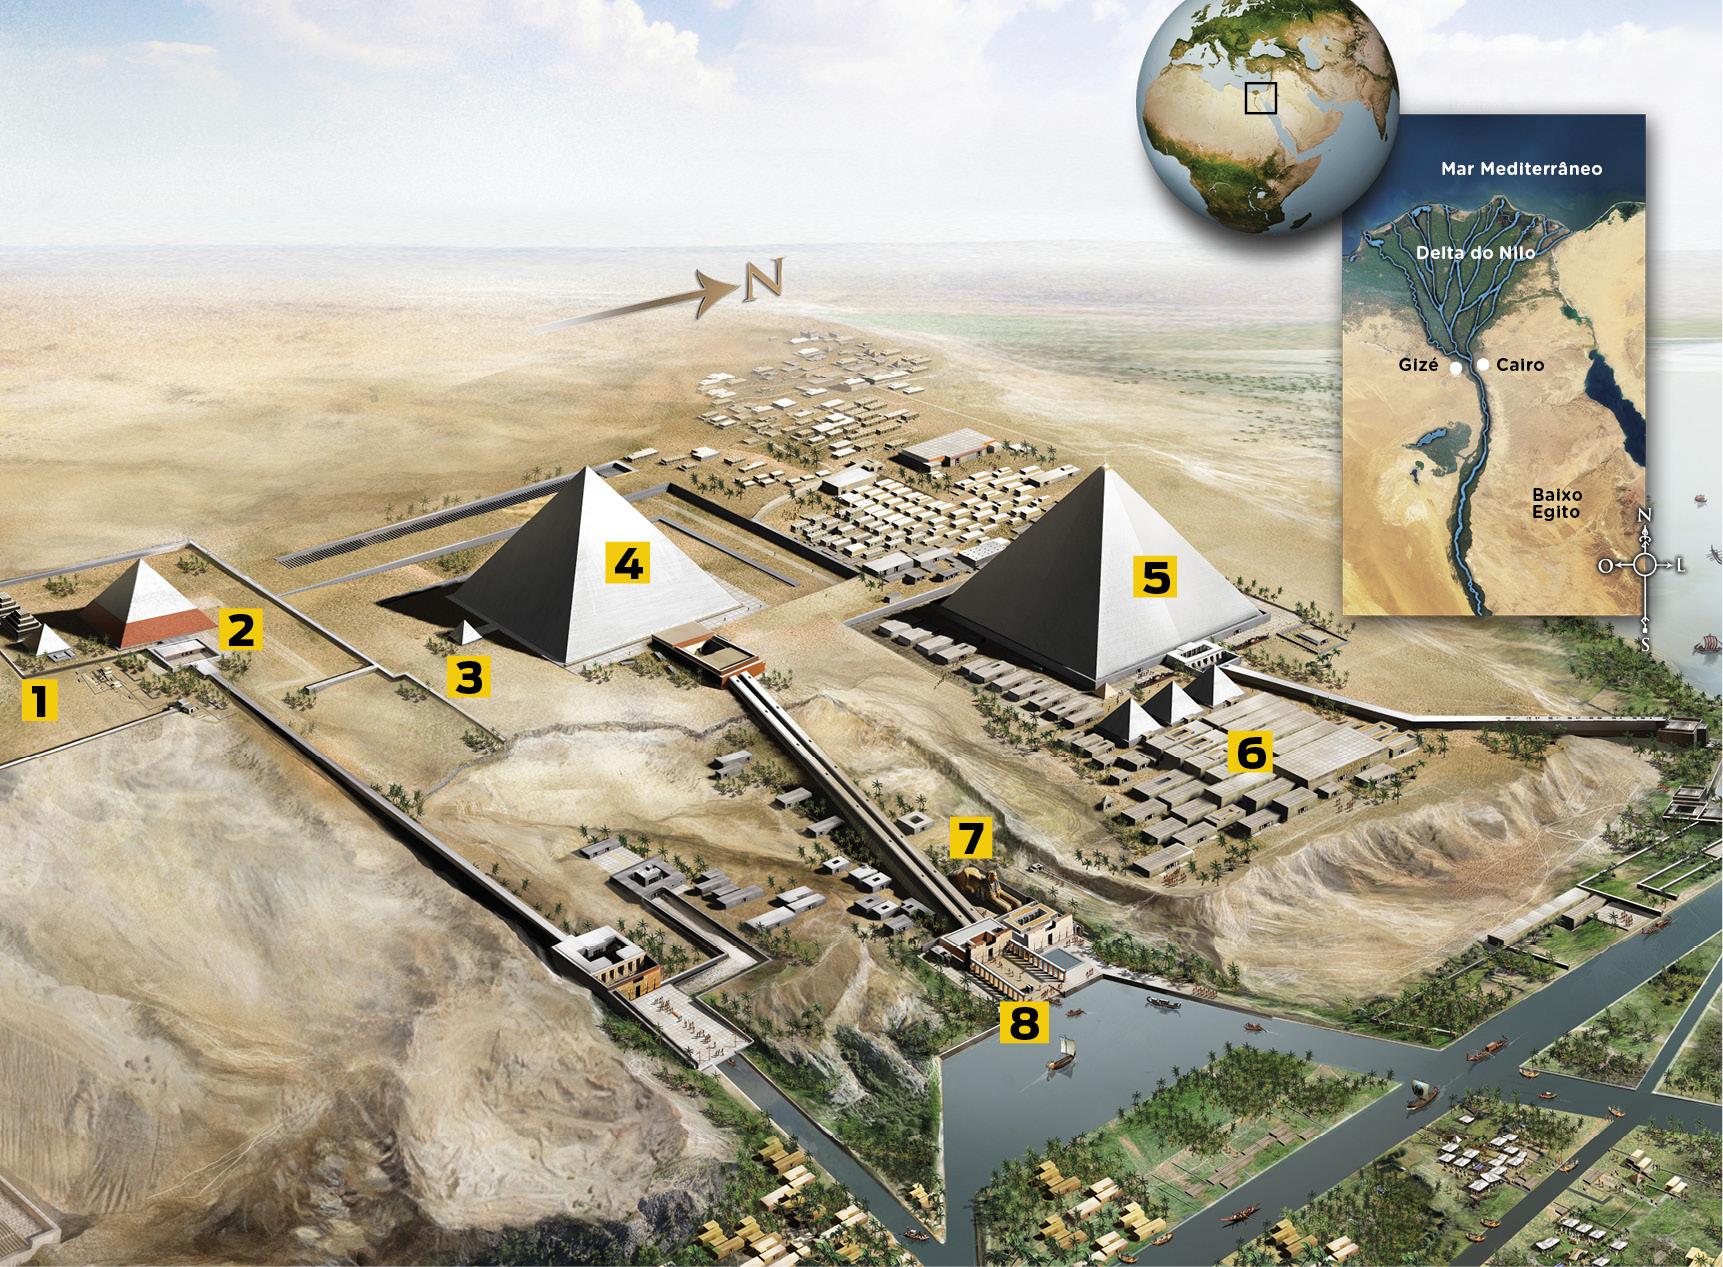 egito - paraíso arqueológico (mapa)